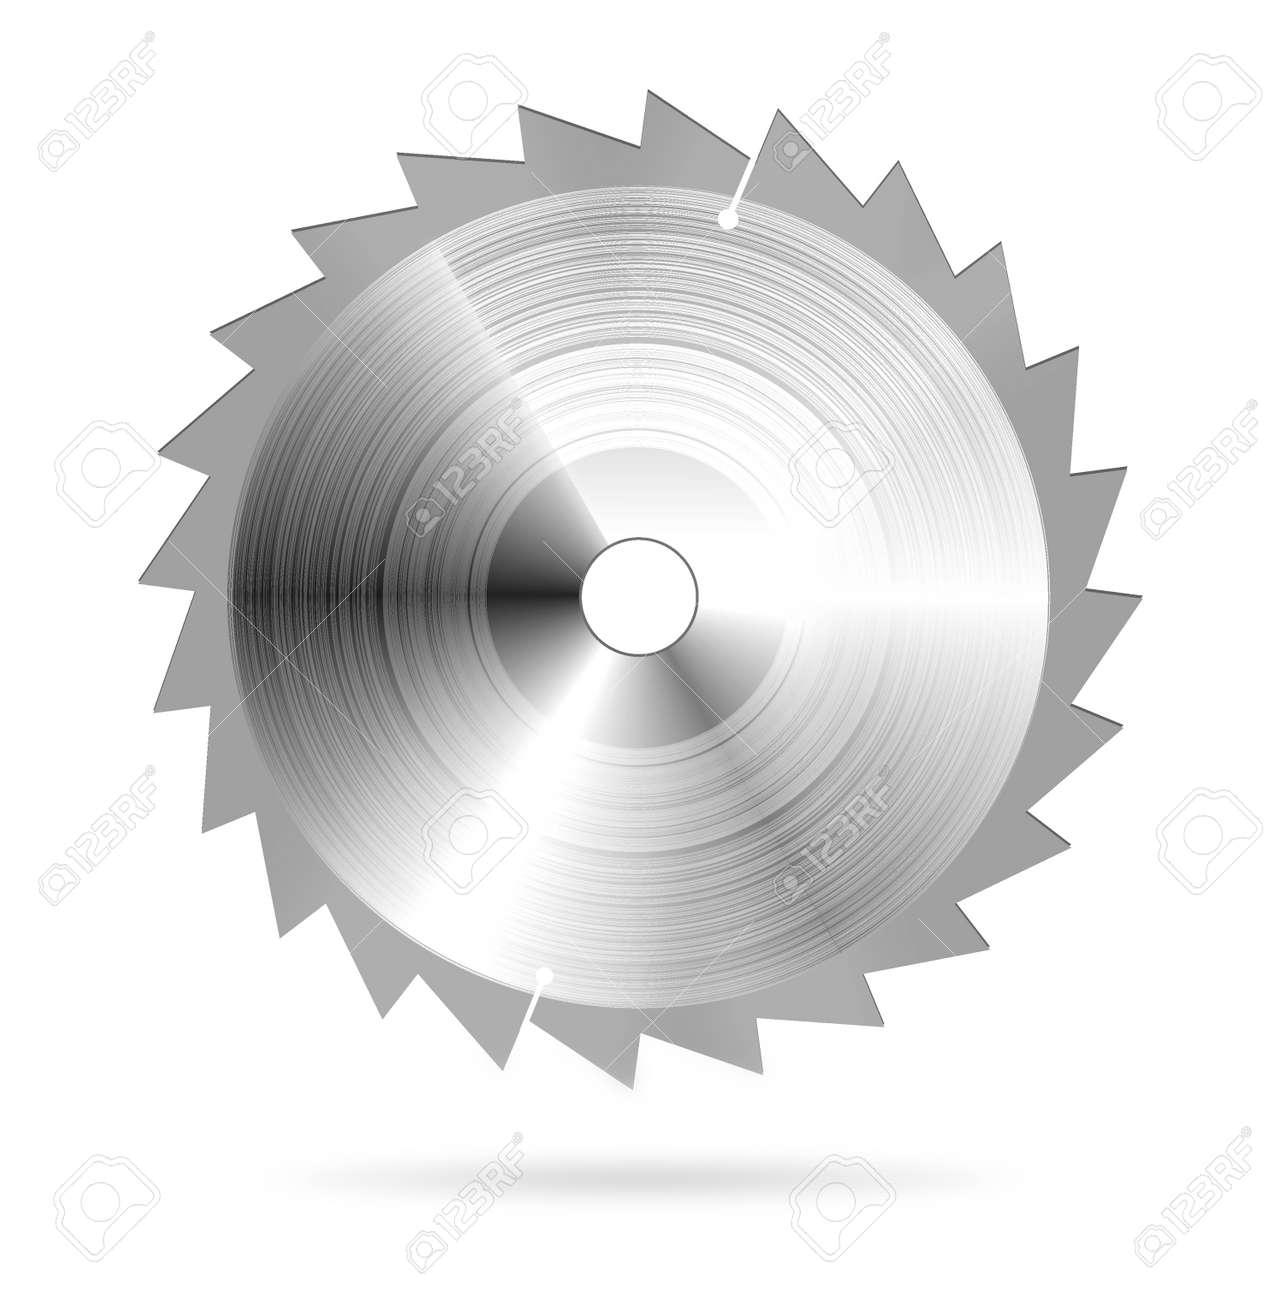 Circular saw blade - 8208173